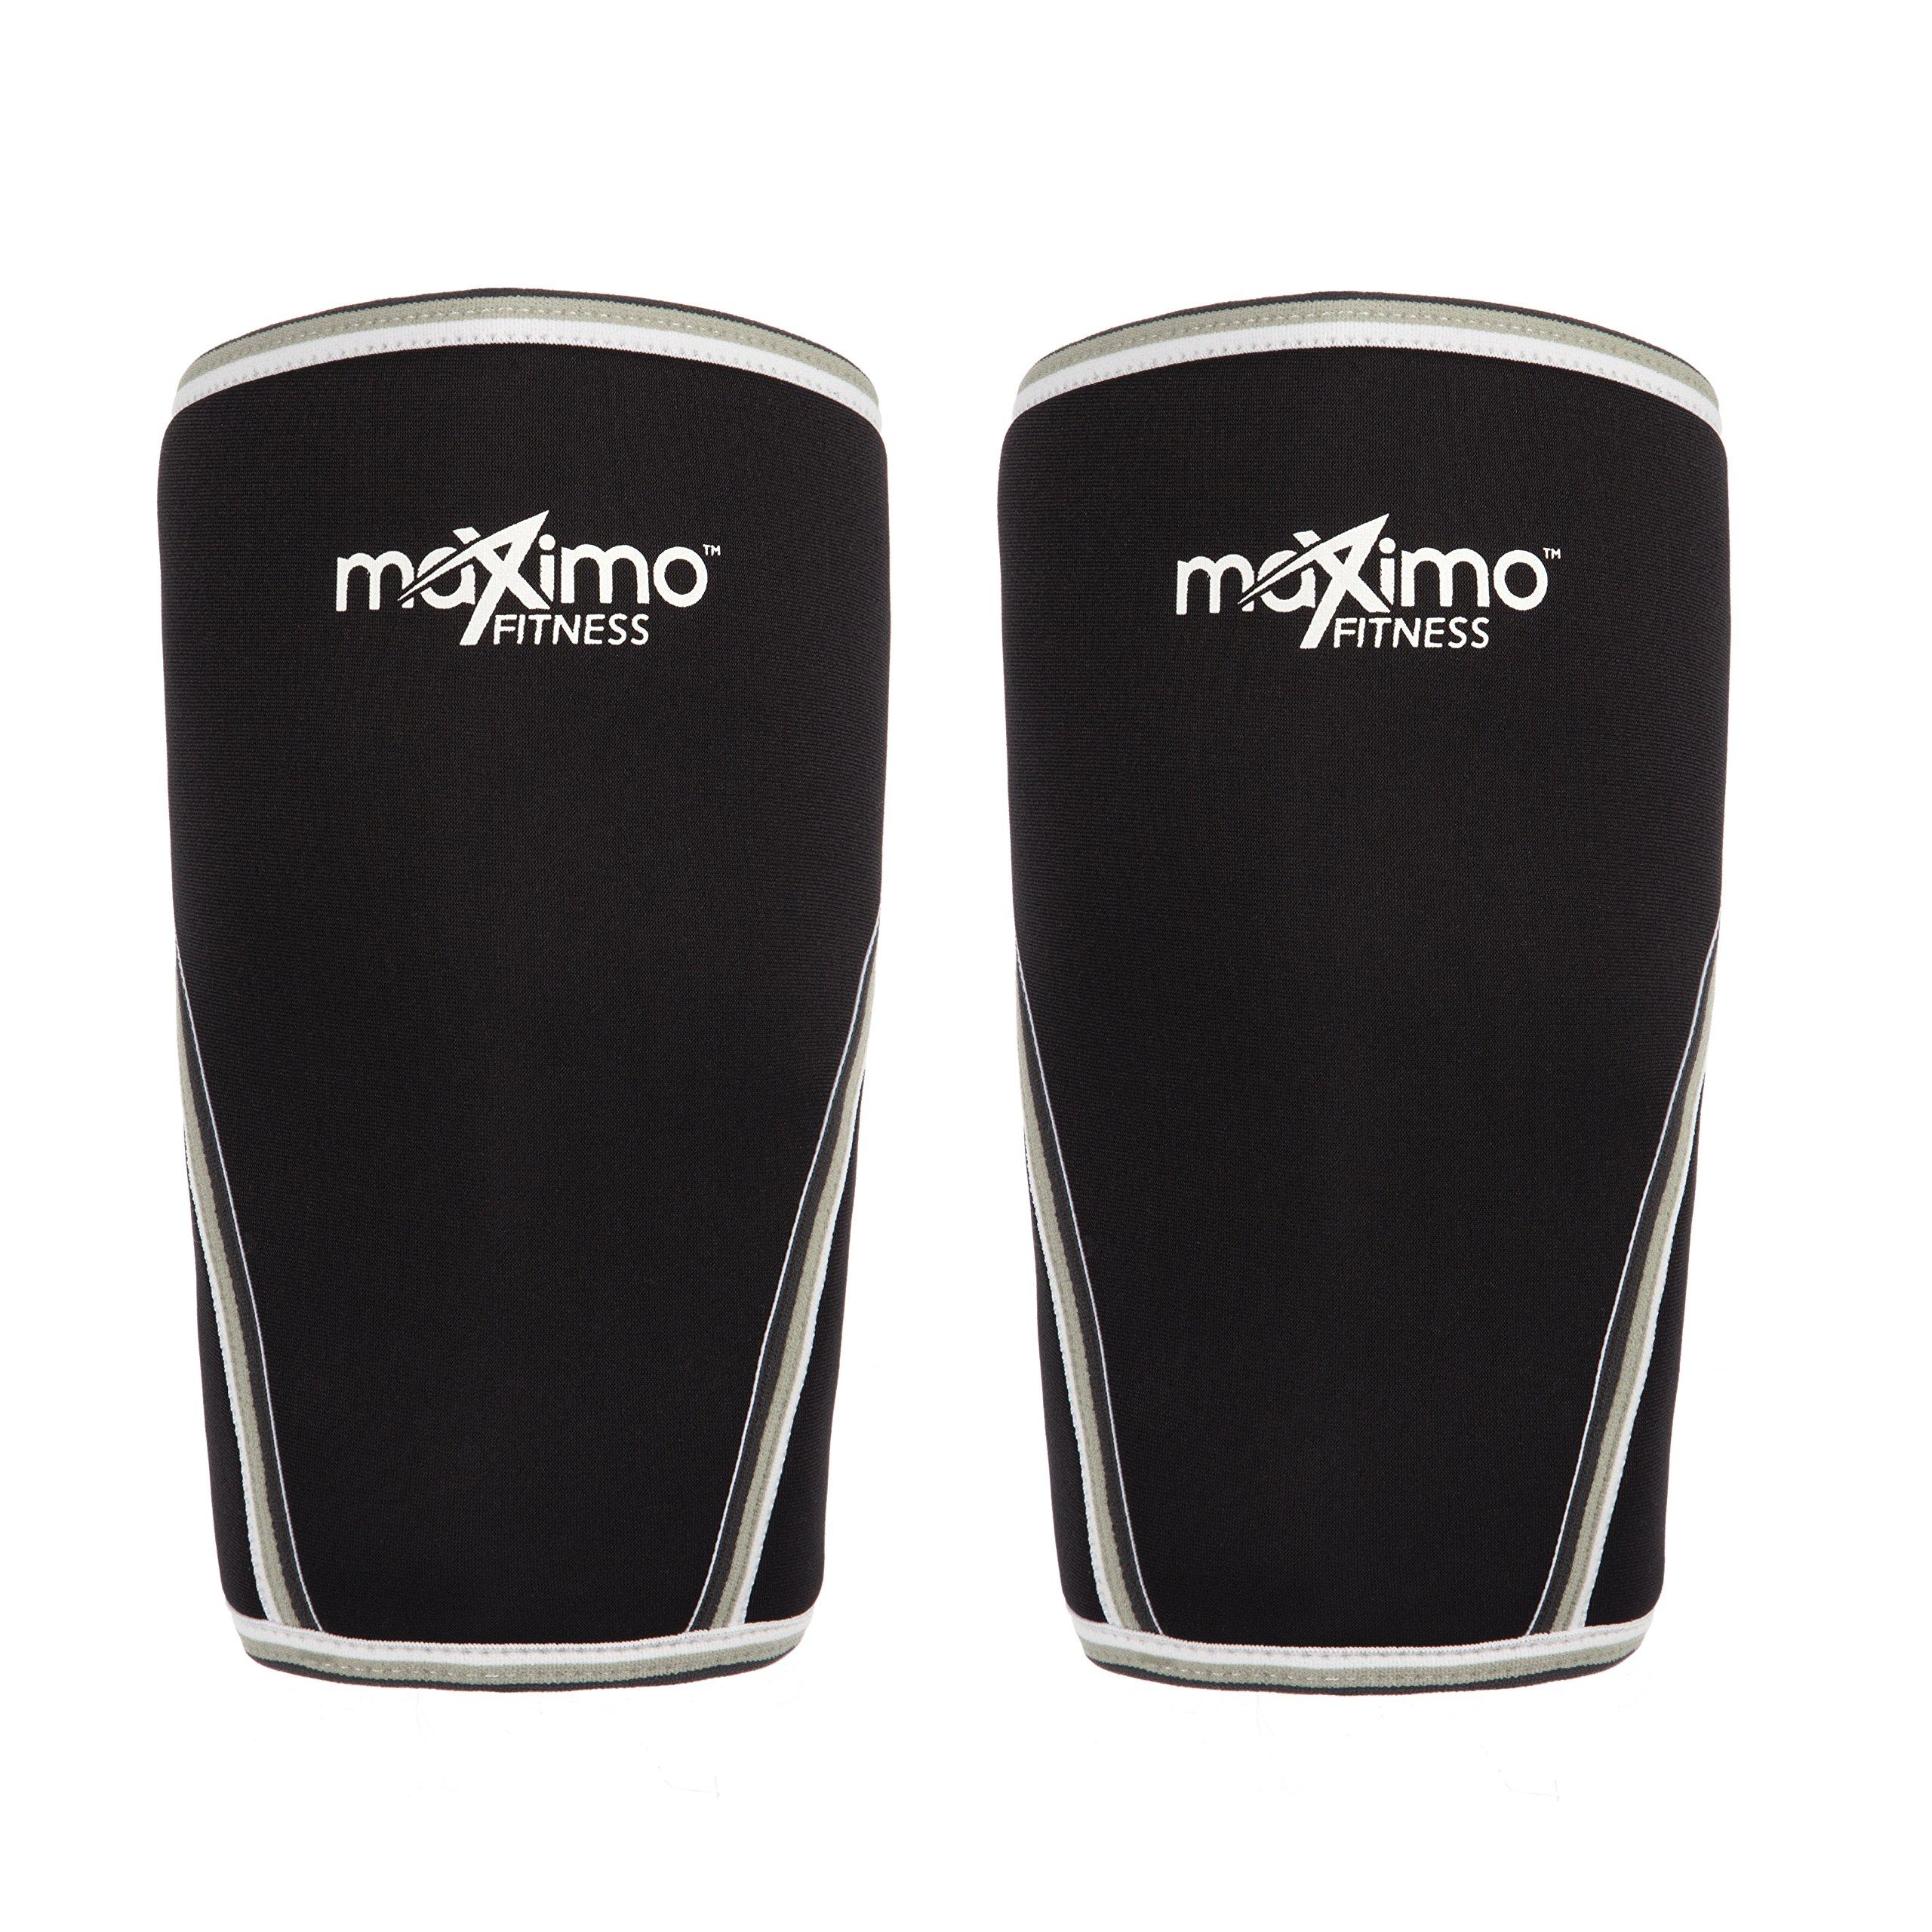 5mm Neoprene Compression Knee Sleeves Gym Weightlifting Powerlifting Fitness